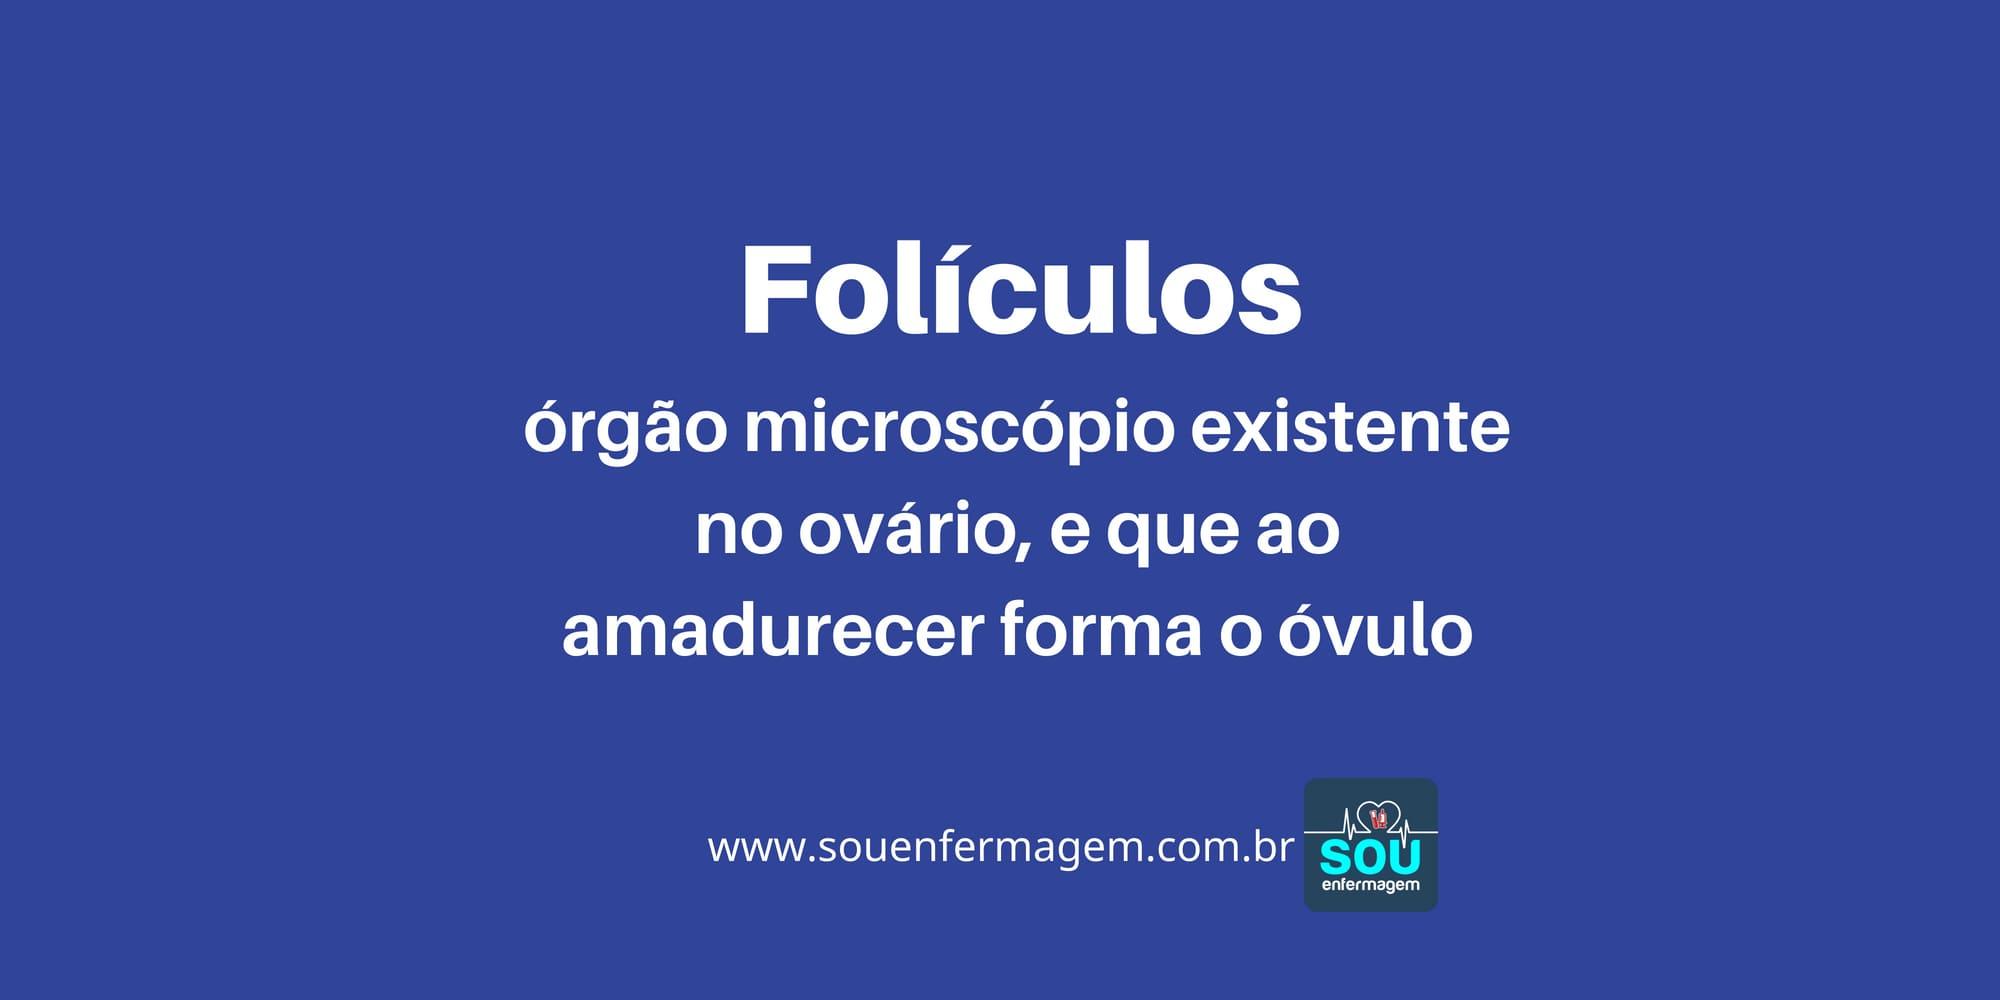 Folículos.jpg